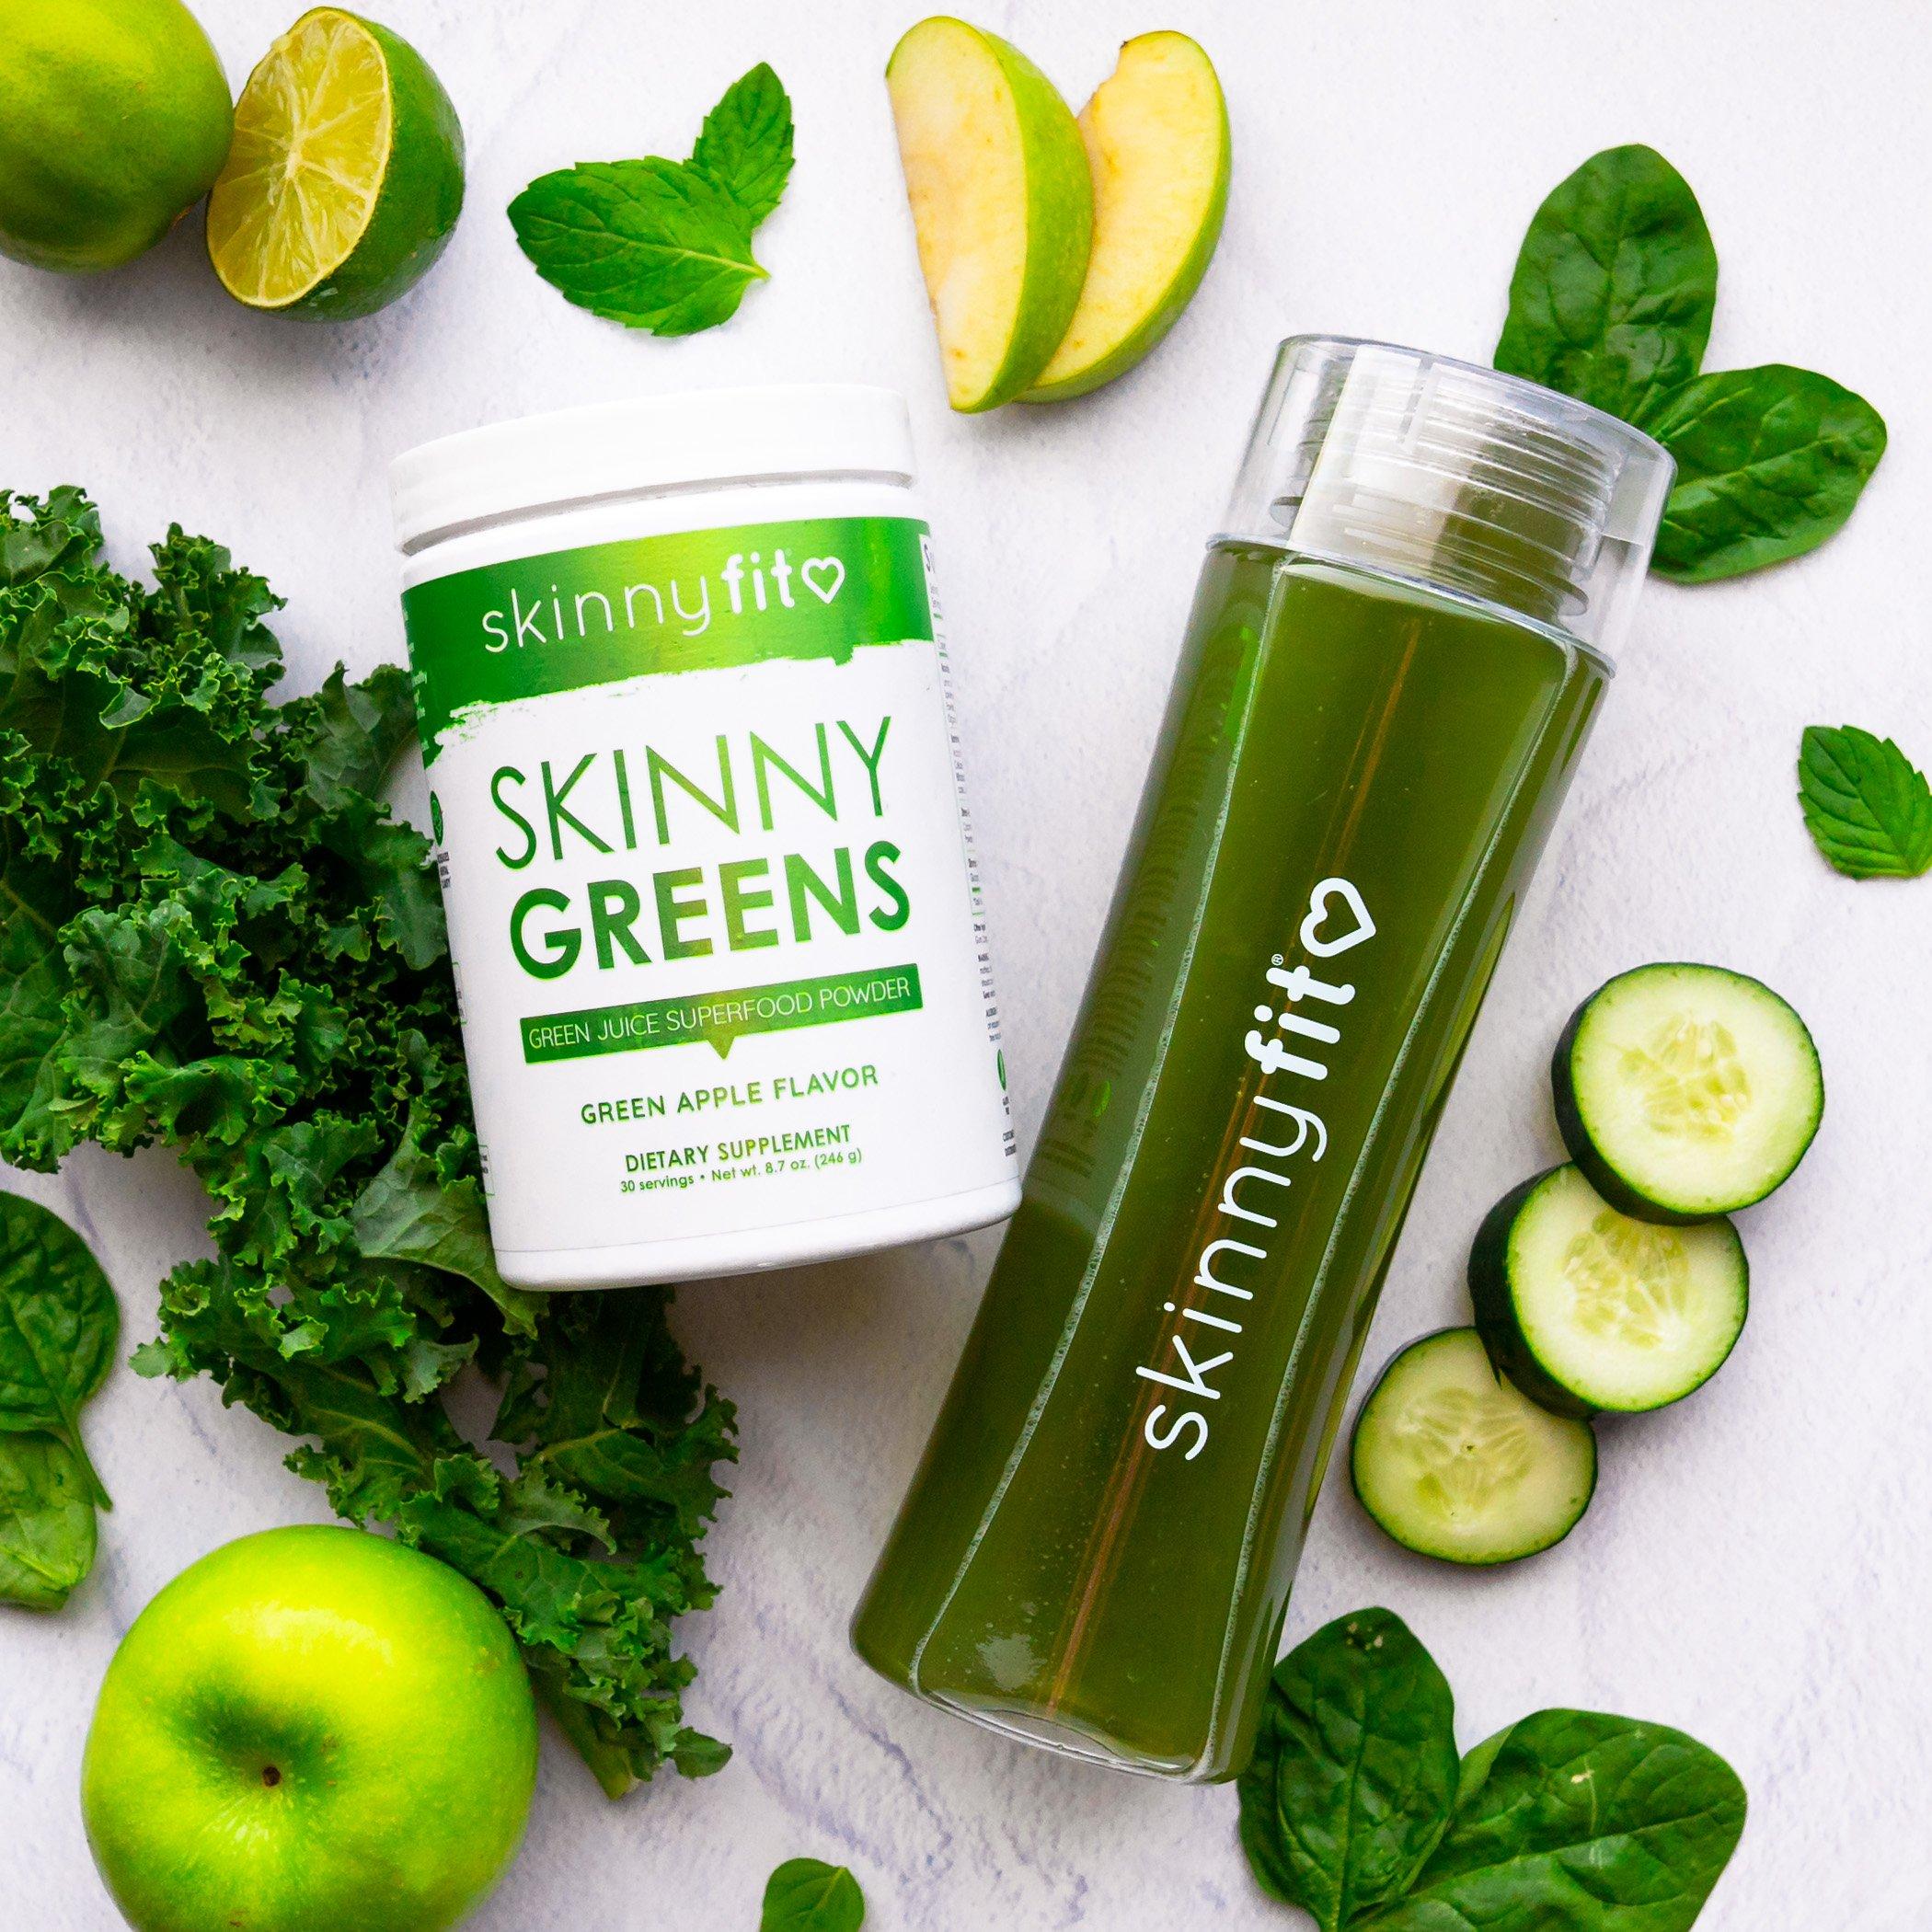 Skinny Greens superfood powder with chlorella and spirulina, so you don't have to choose between chlorella vs spirulina